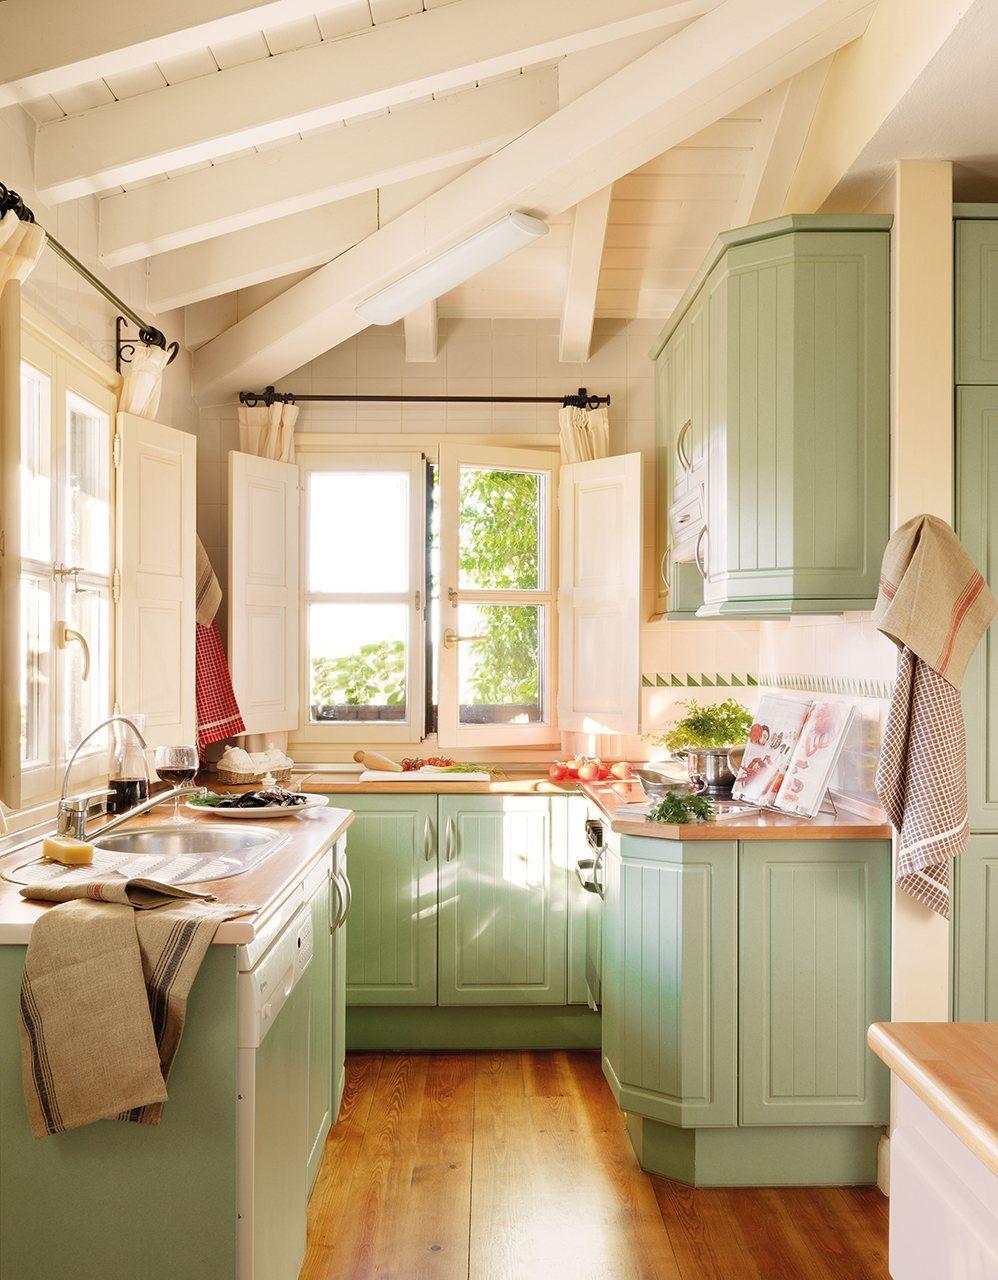 40 Ideas Para Pisos Peque Os Elmueble Com Escuela Deco  # Muebles Pequenos Para Cocina